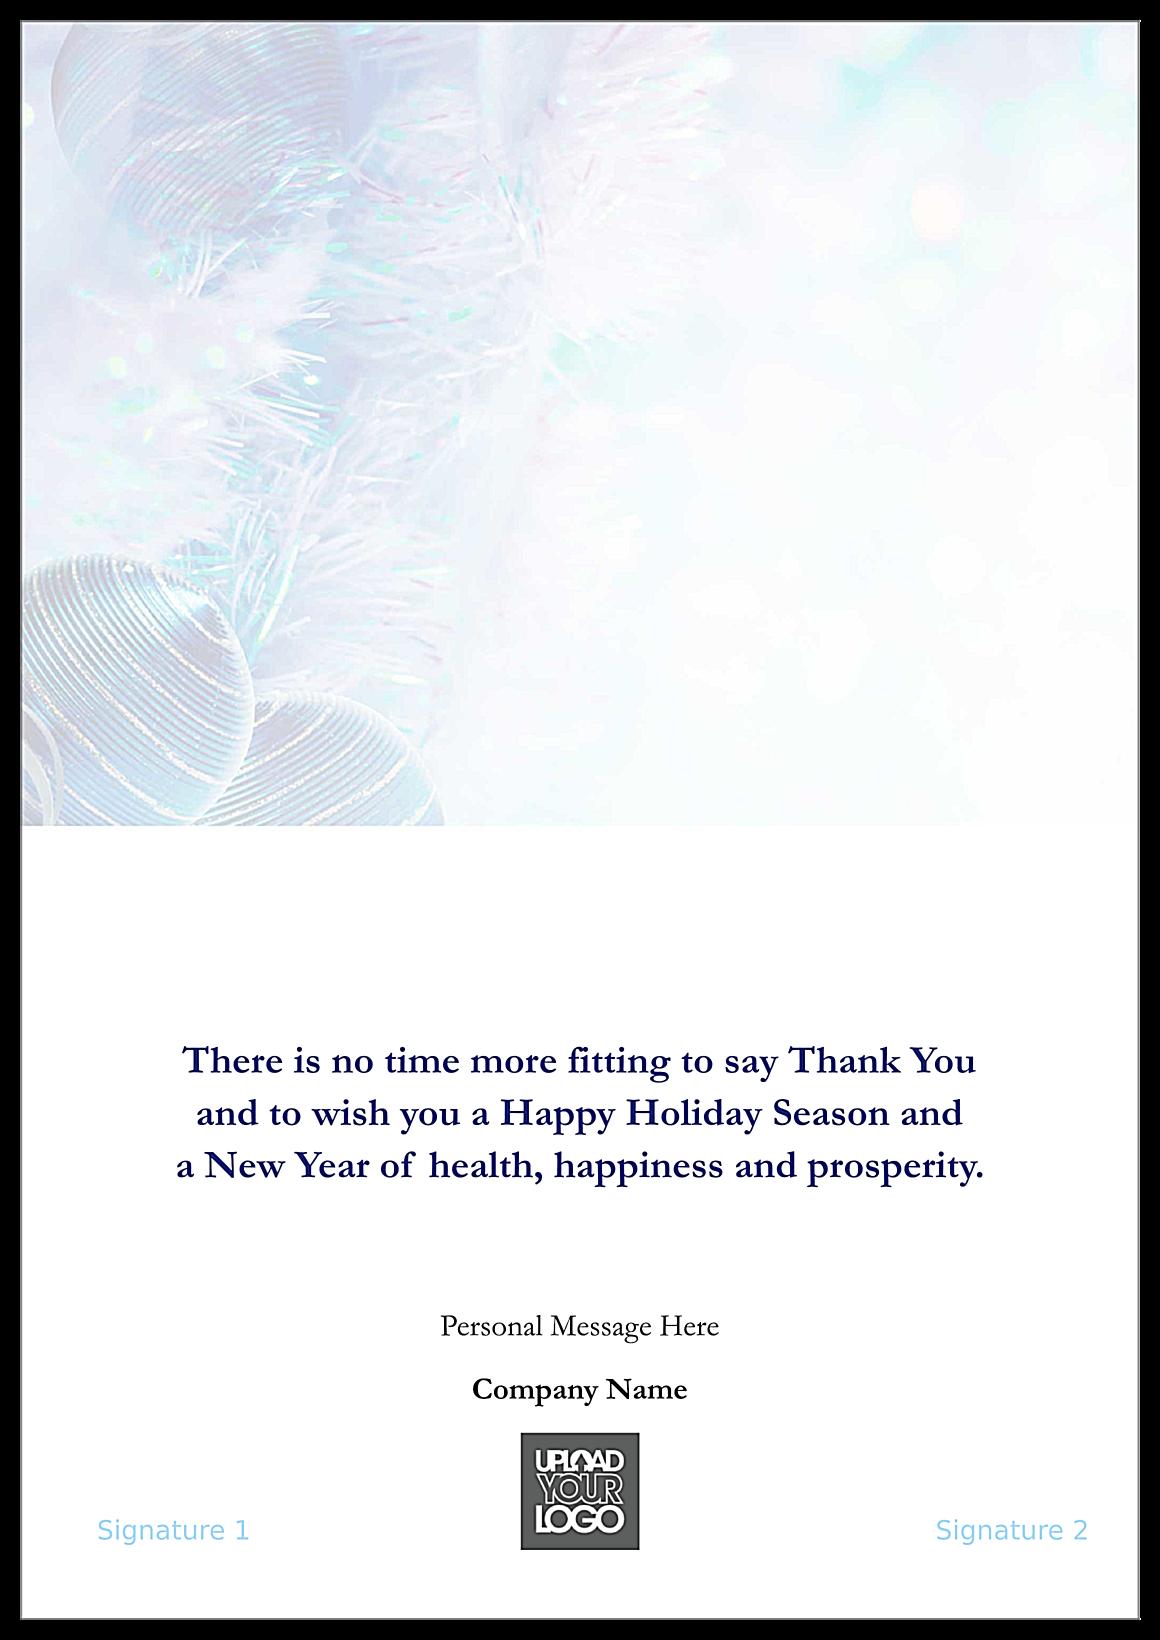 Thank You Garlands back - Greeting Cards Maker